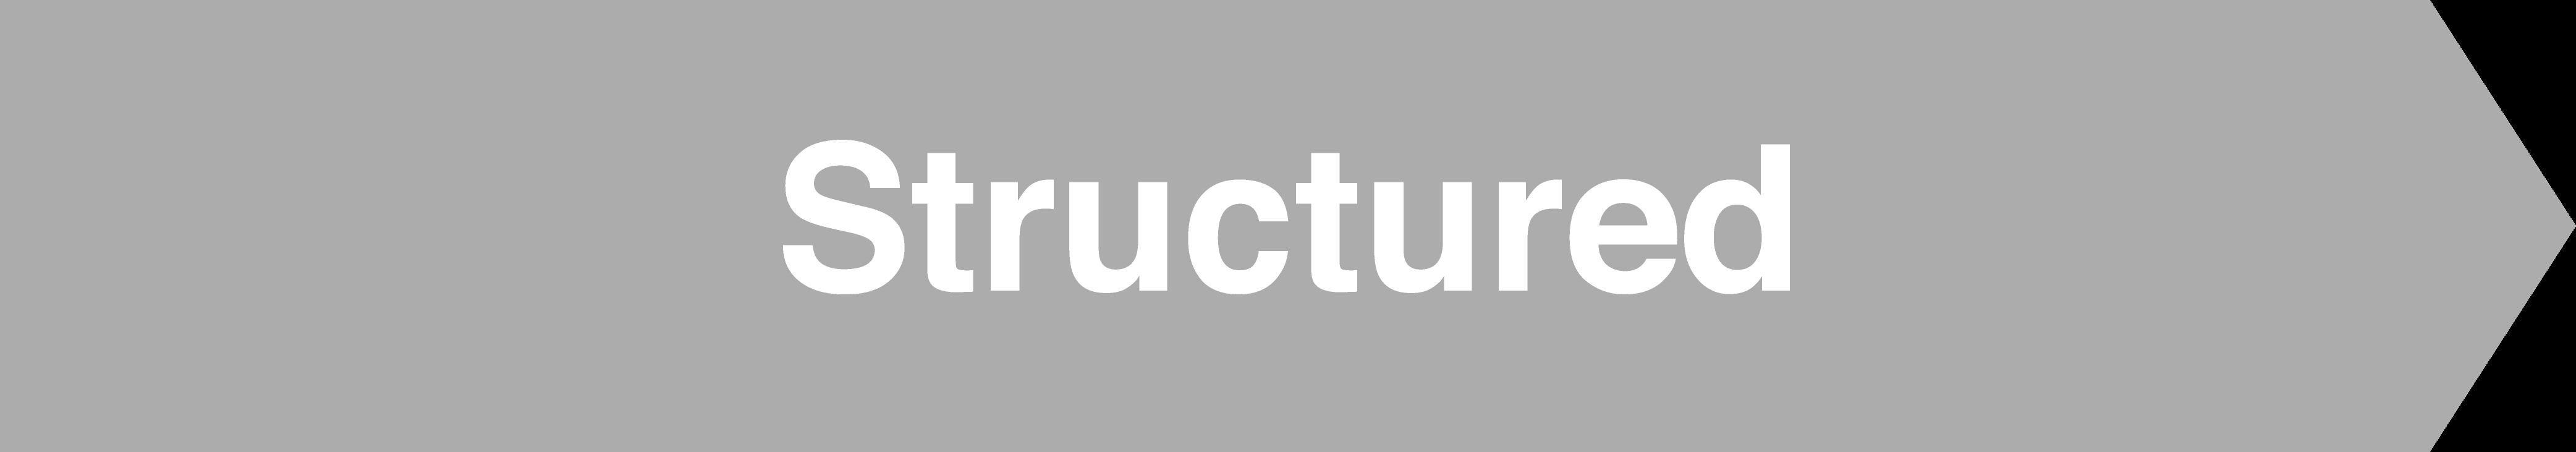 Structured